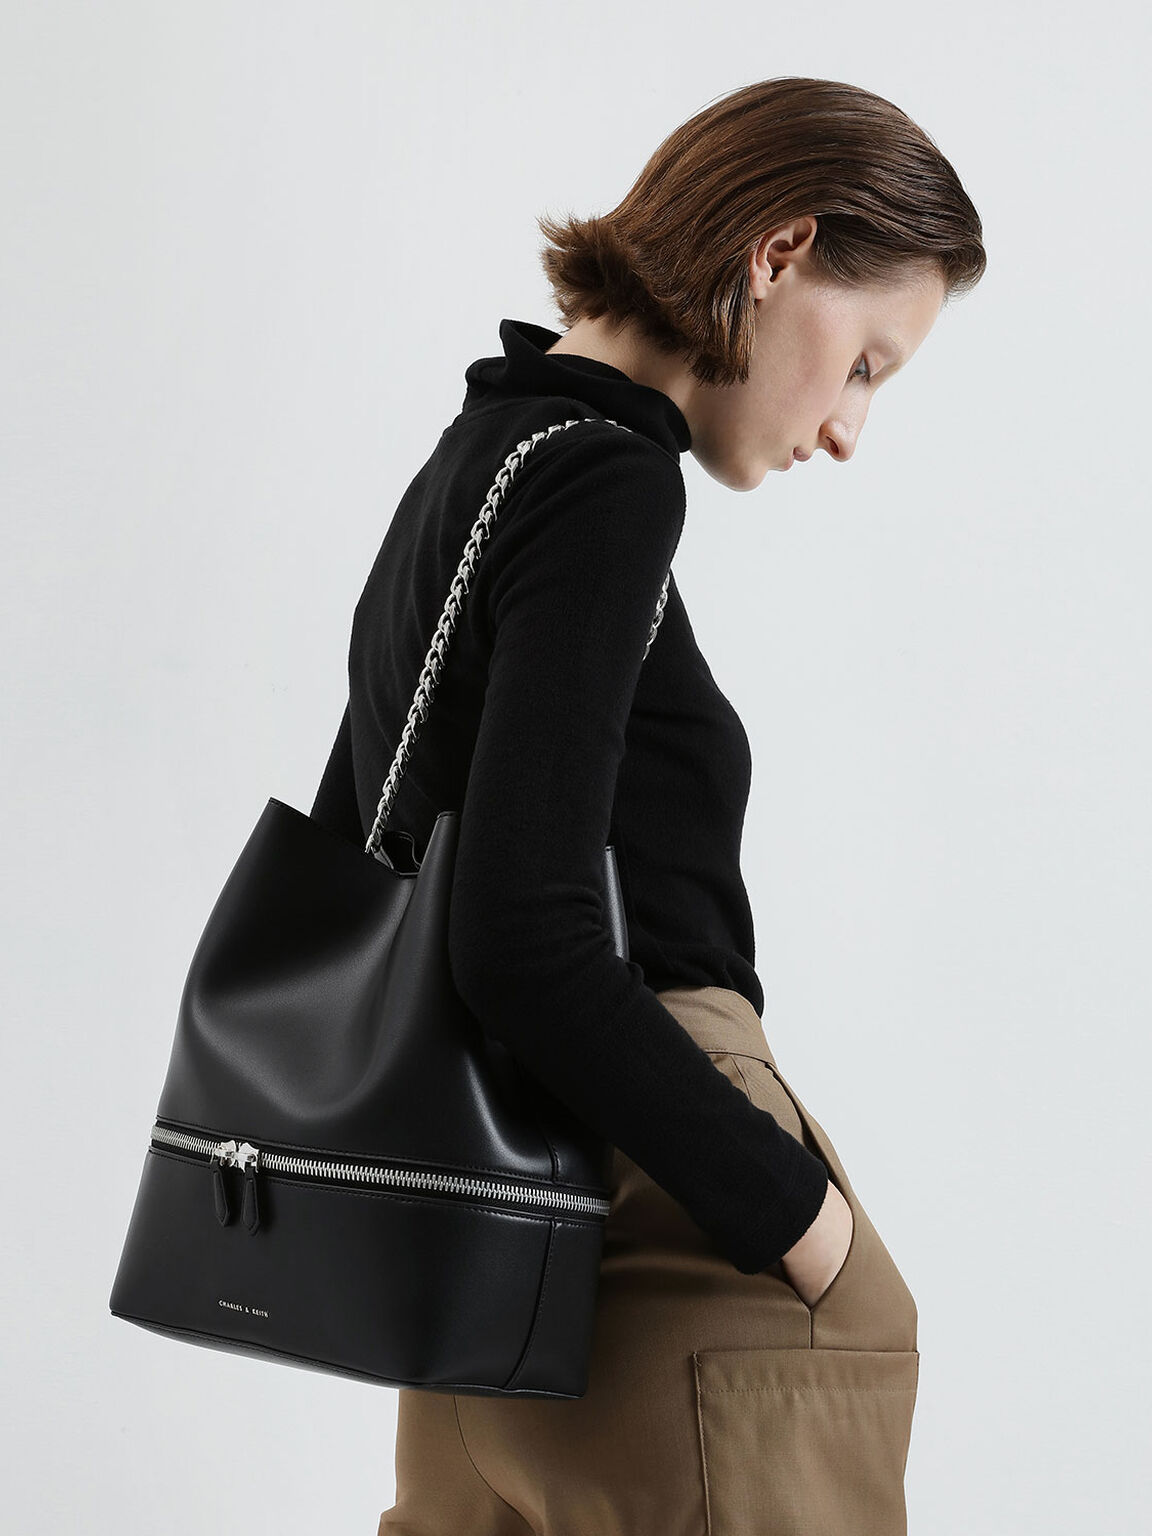 Two-Way Zip Hobo Bag, Black, hi-res